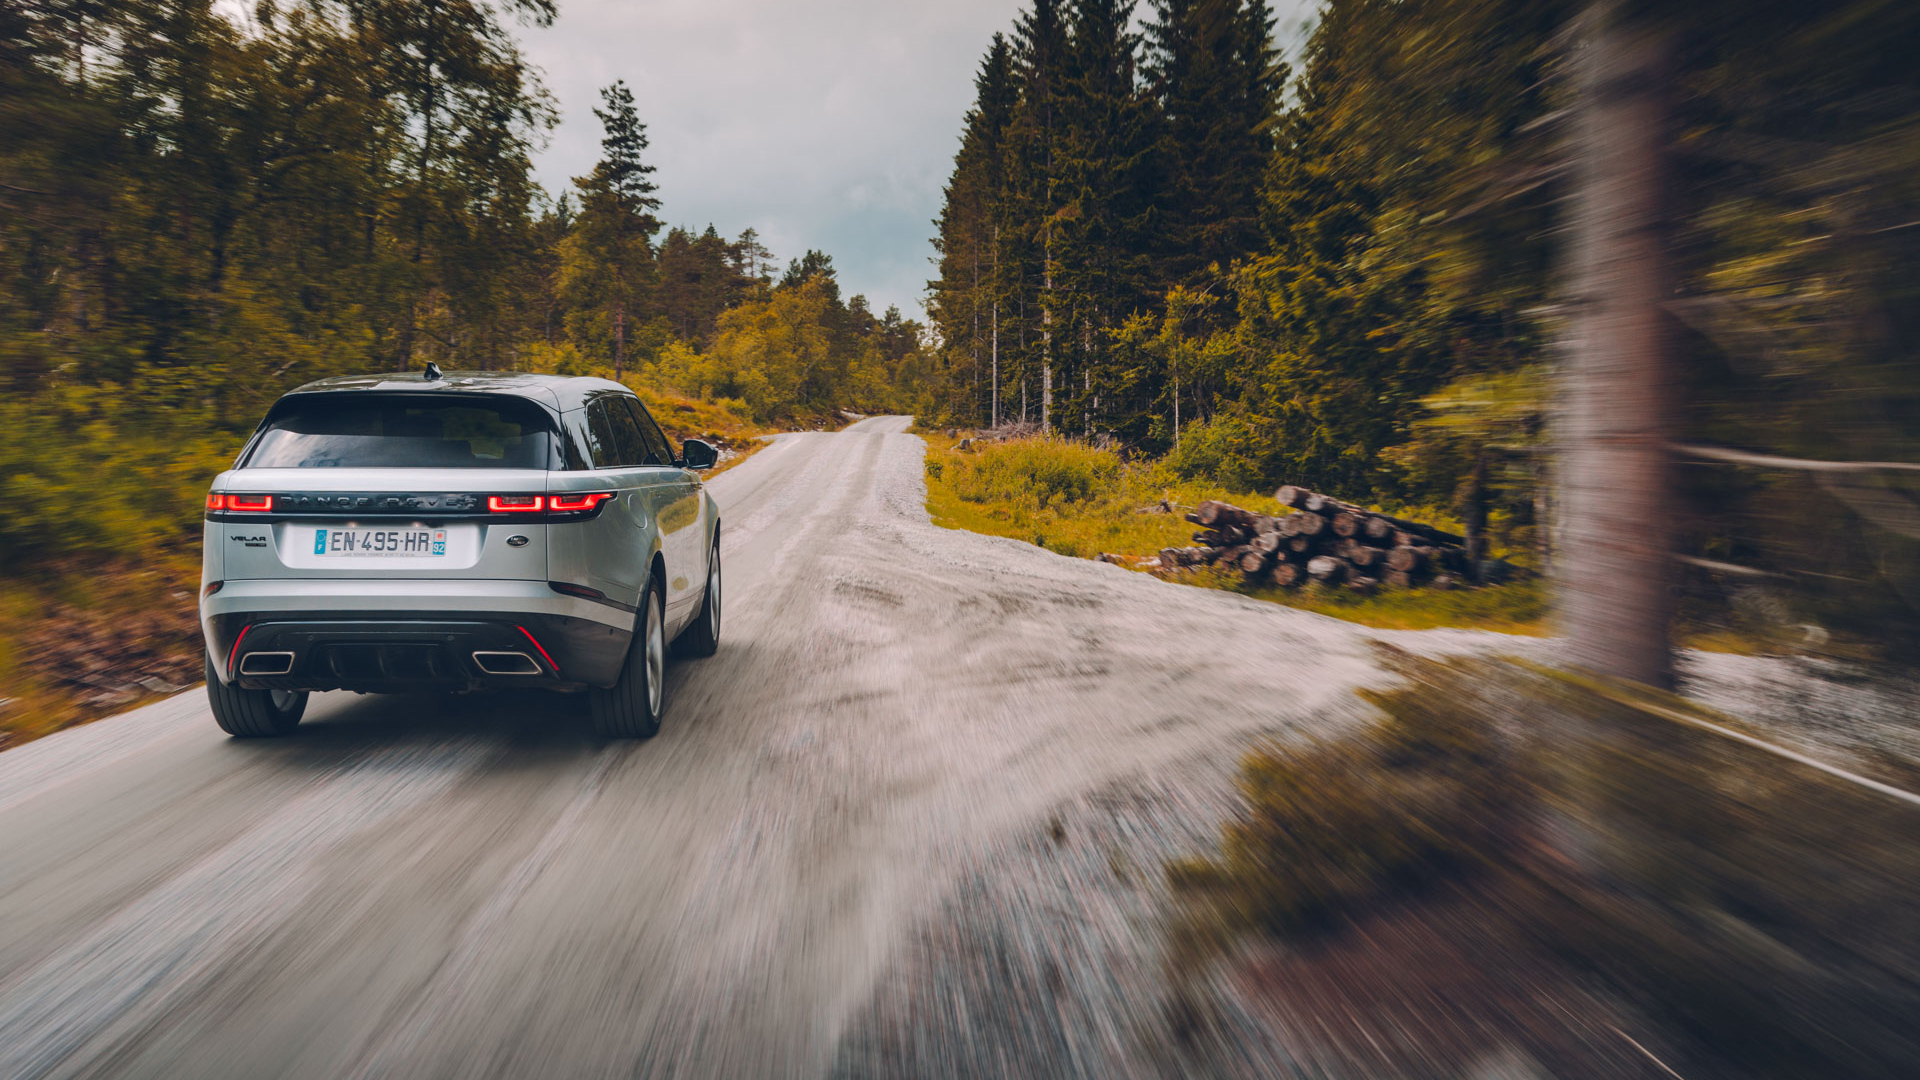 Land Rover Range Rover Velar rear